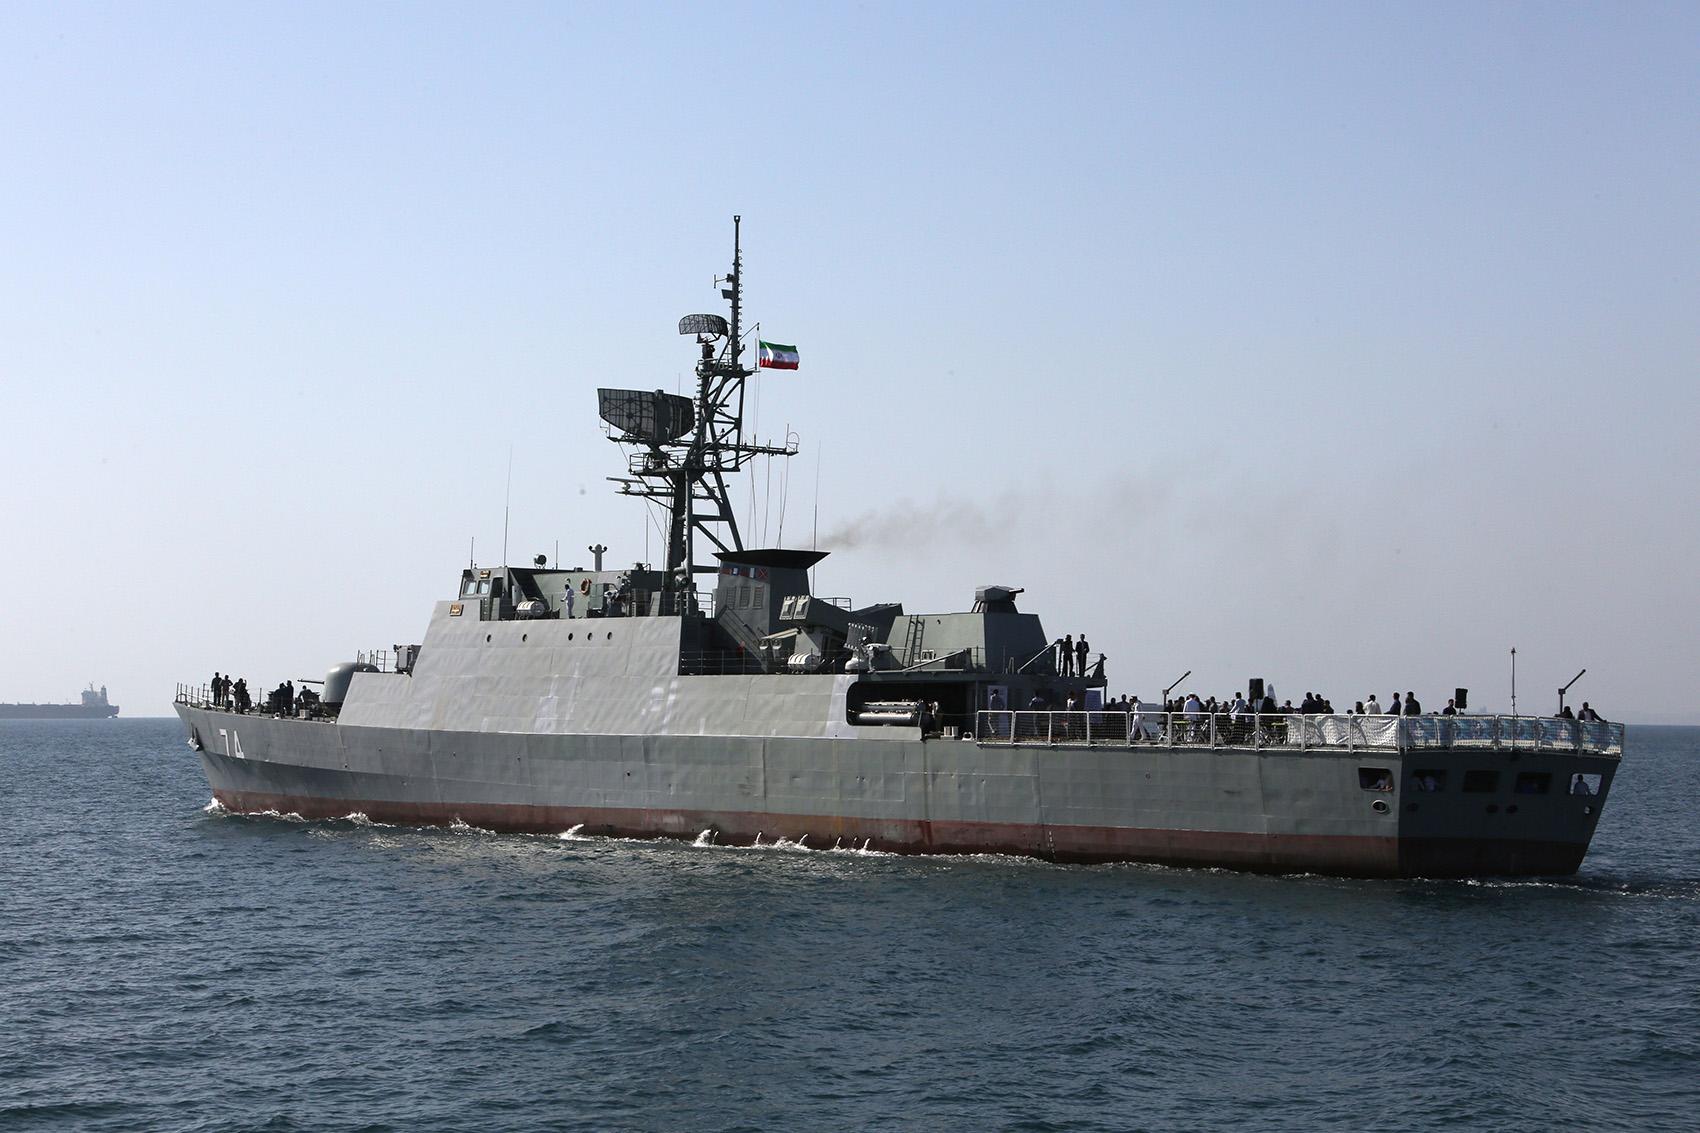 Iranian navy ship in Strait of Hormuz